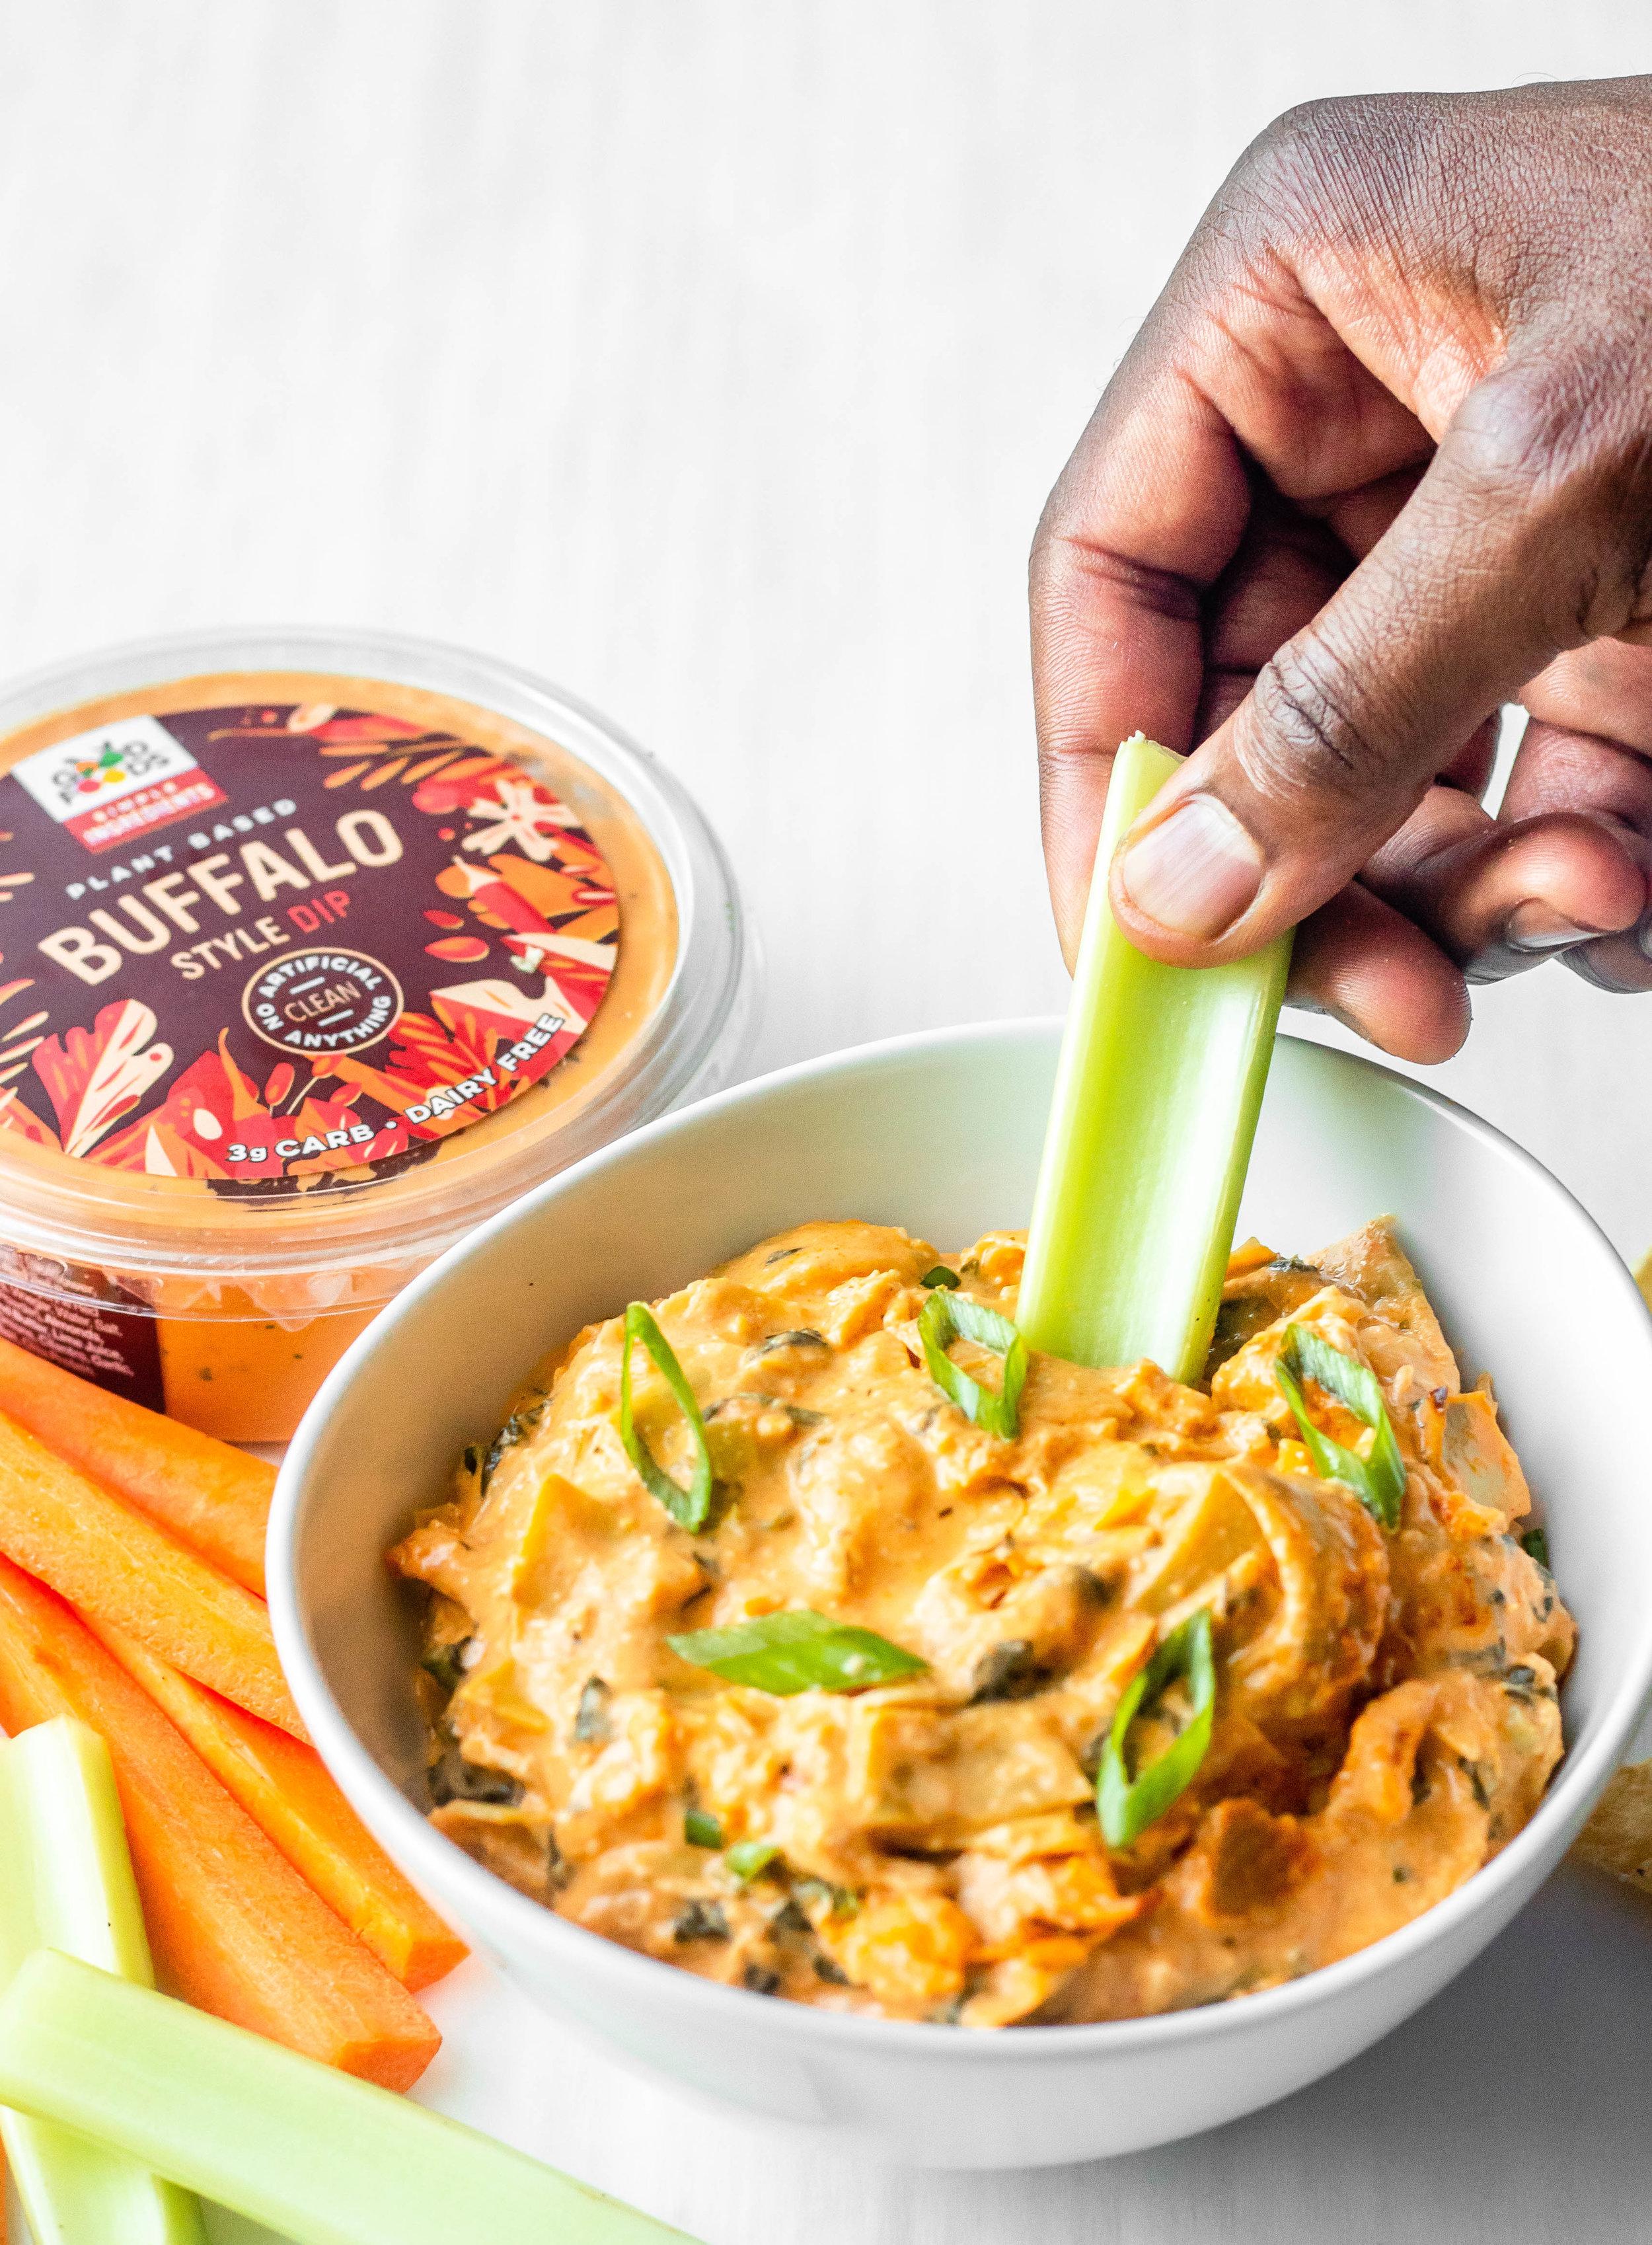 Buffalo Chicken Spinach Artichoke Dip (Dairy Free + Paleo)